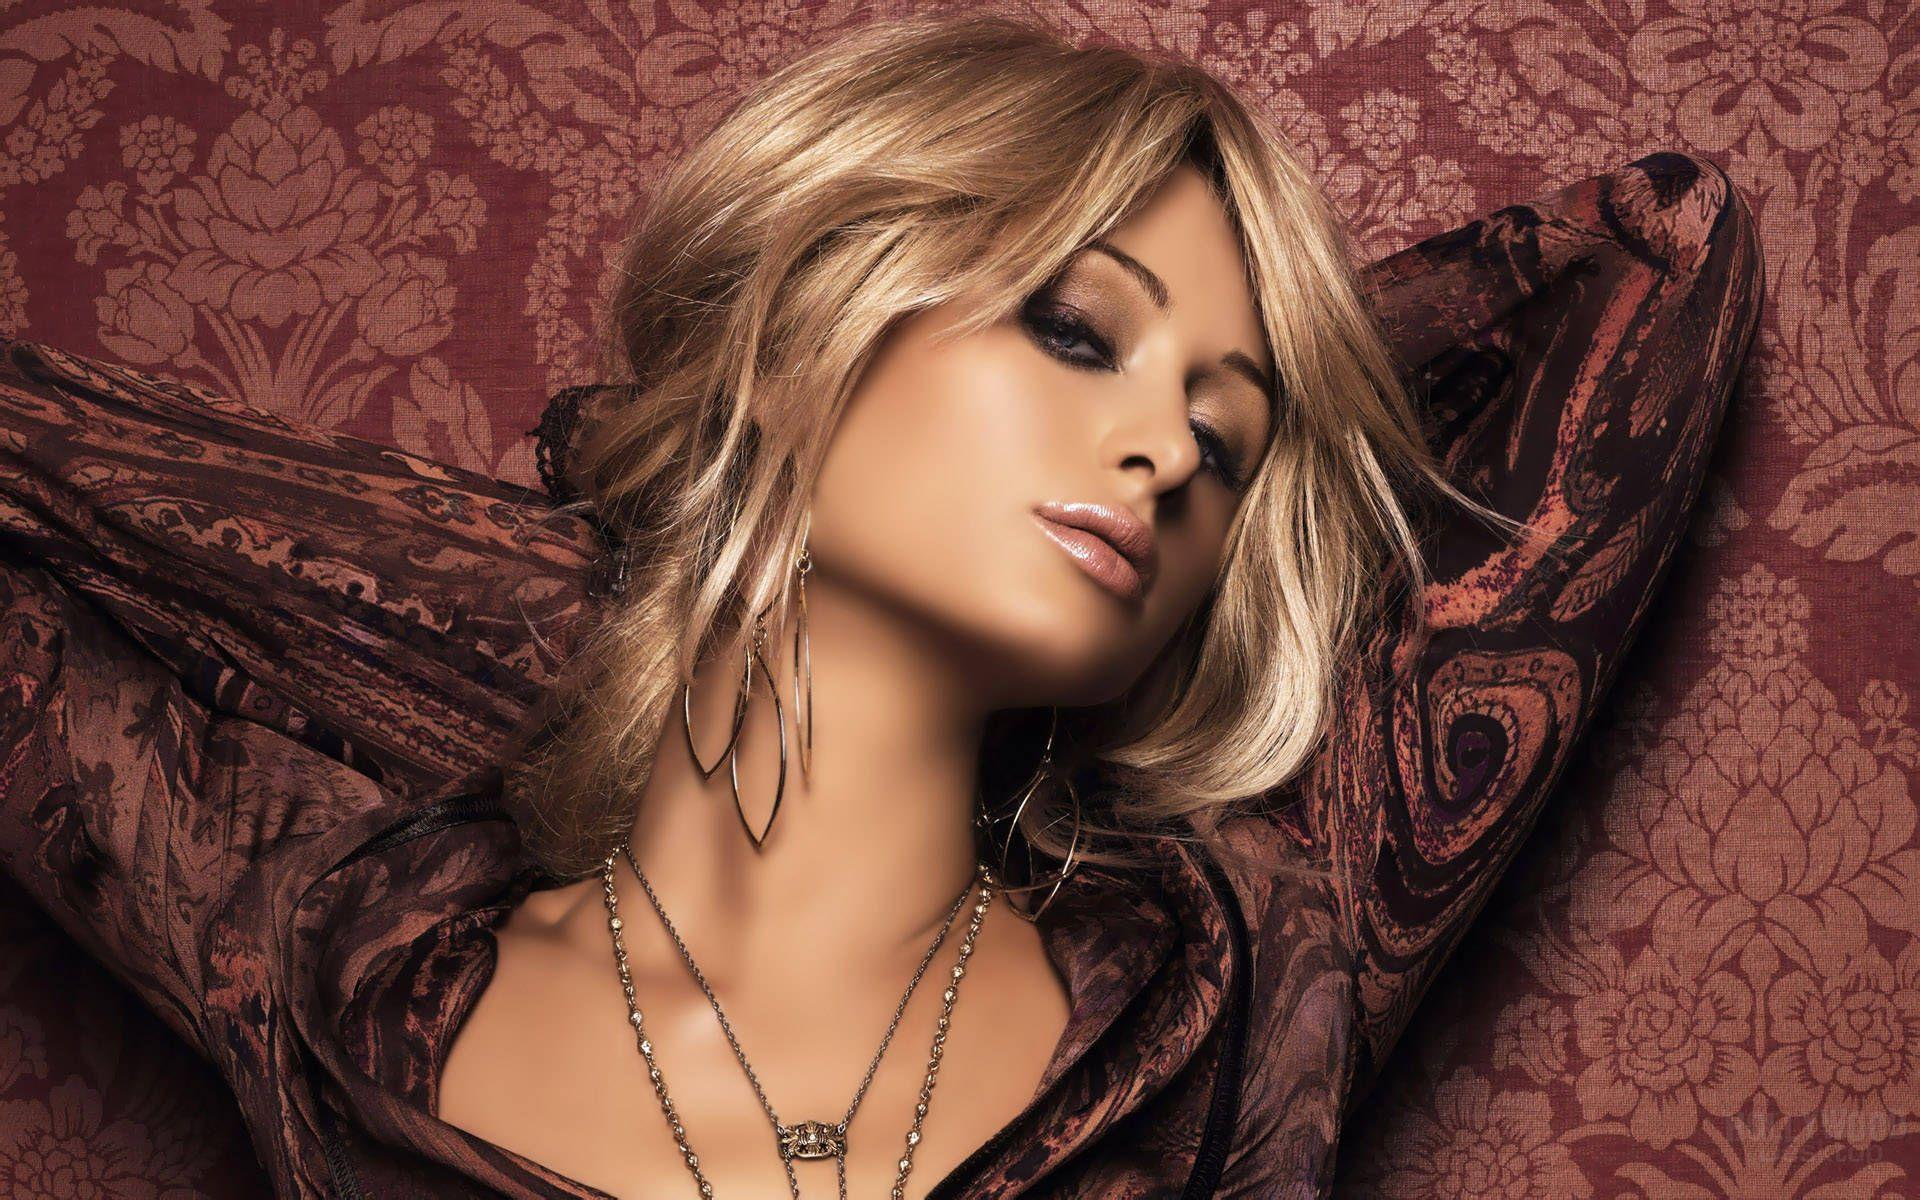 14 HD Paris Hilton Wallpapers - HDWallSource.com